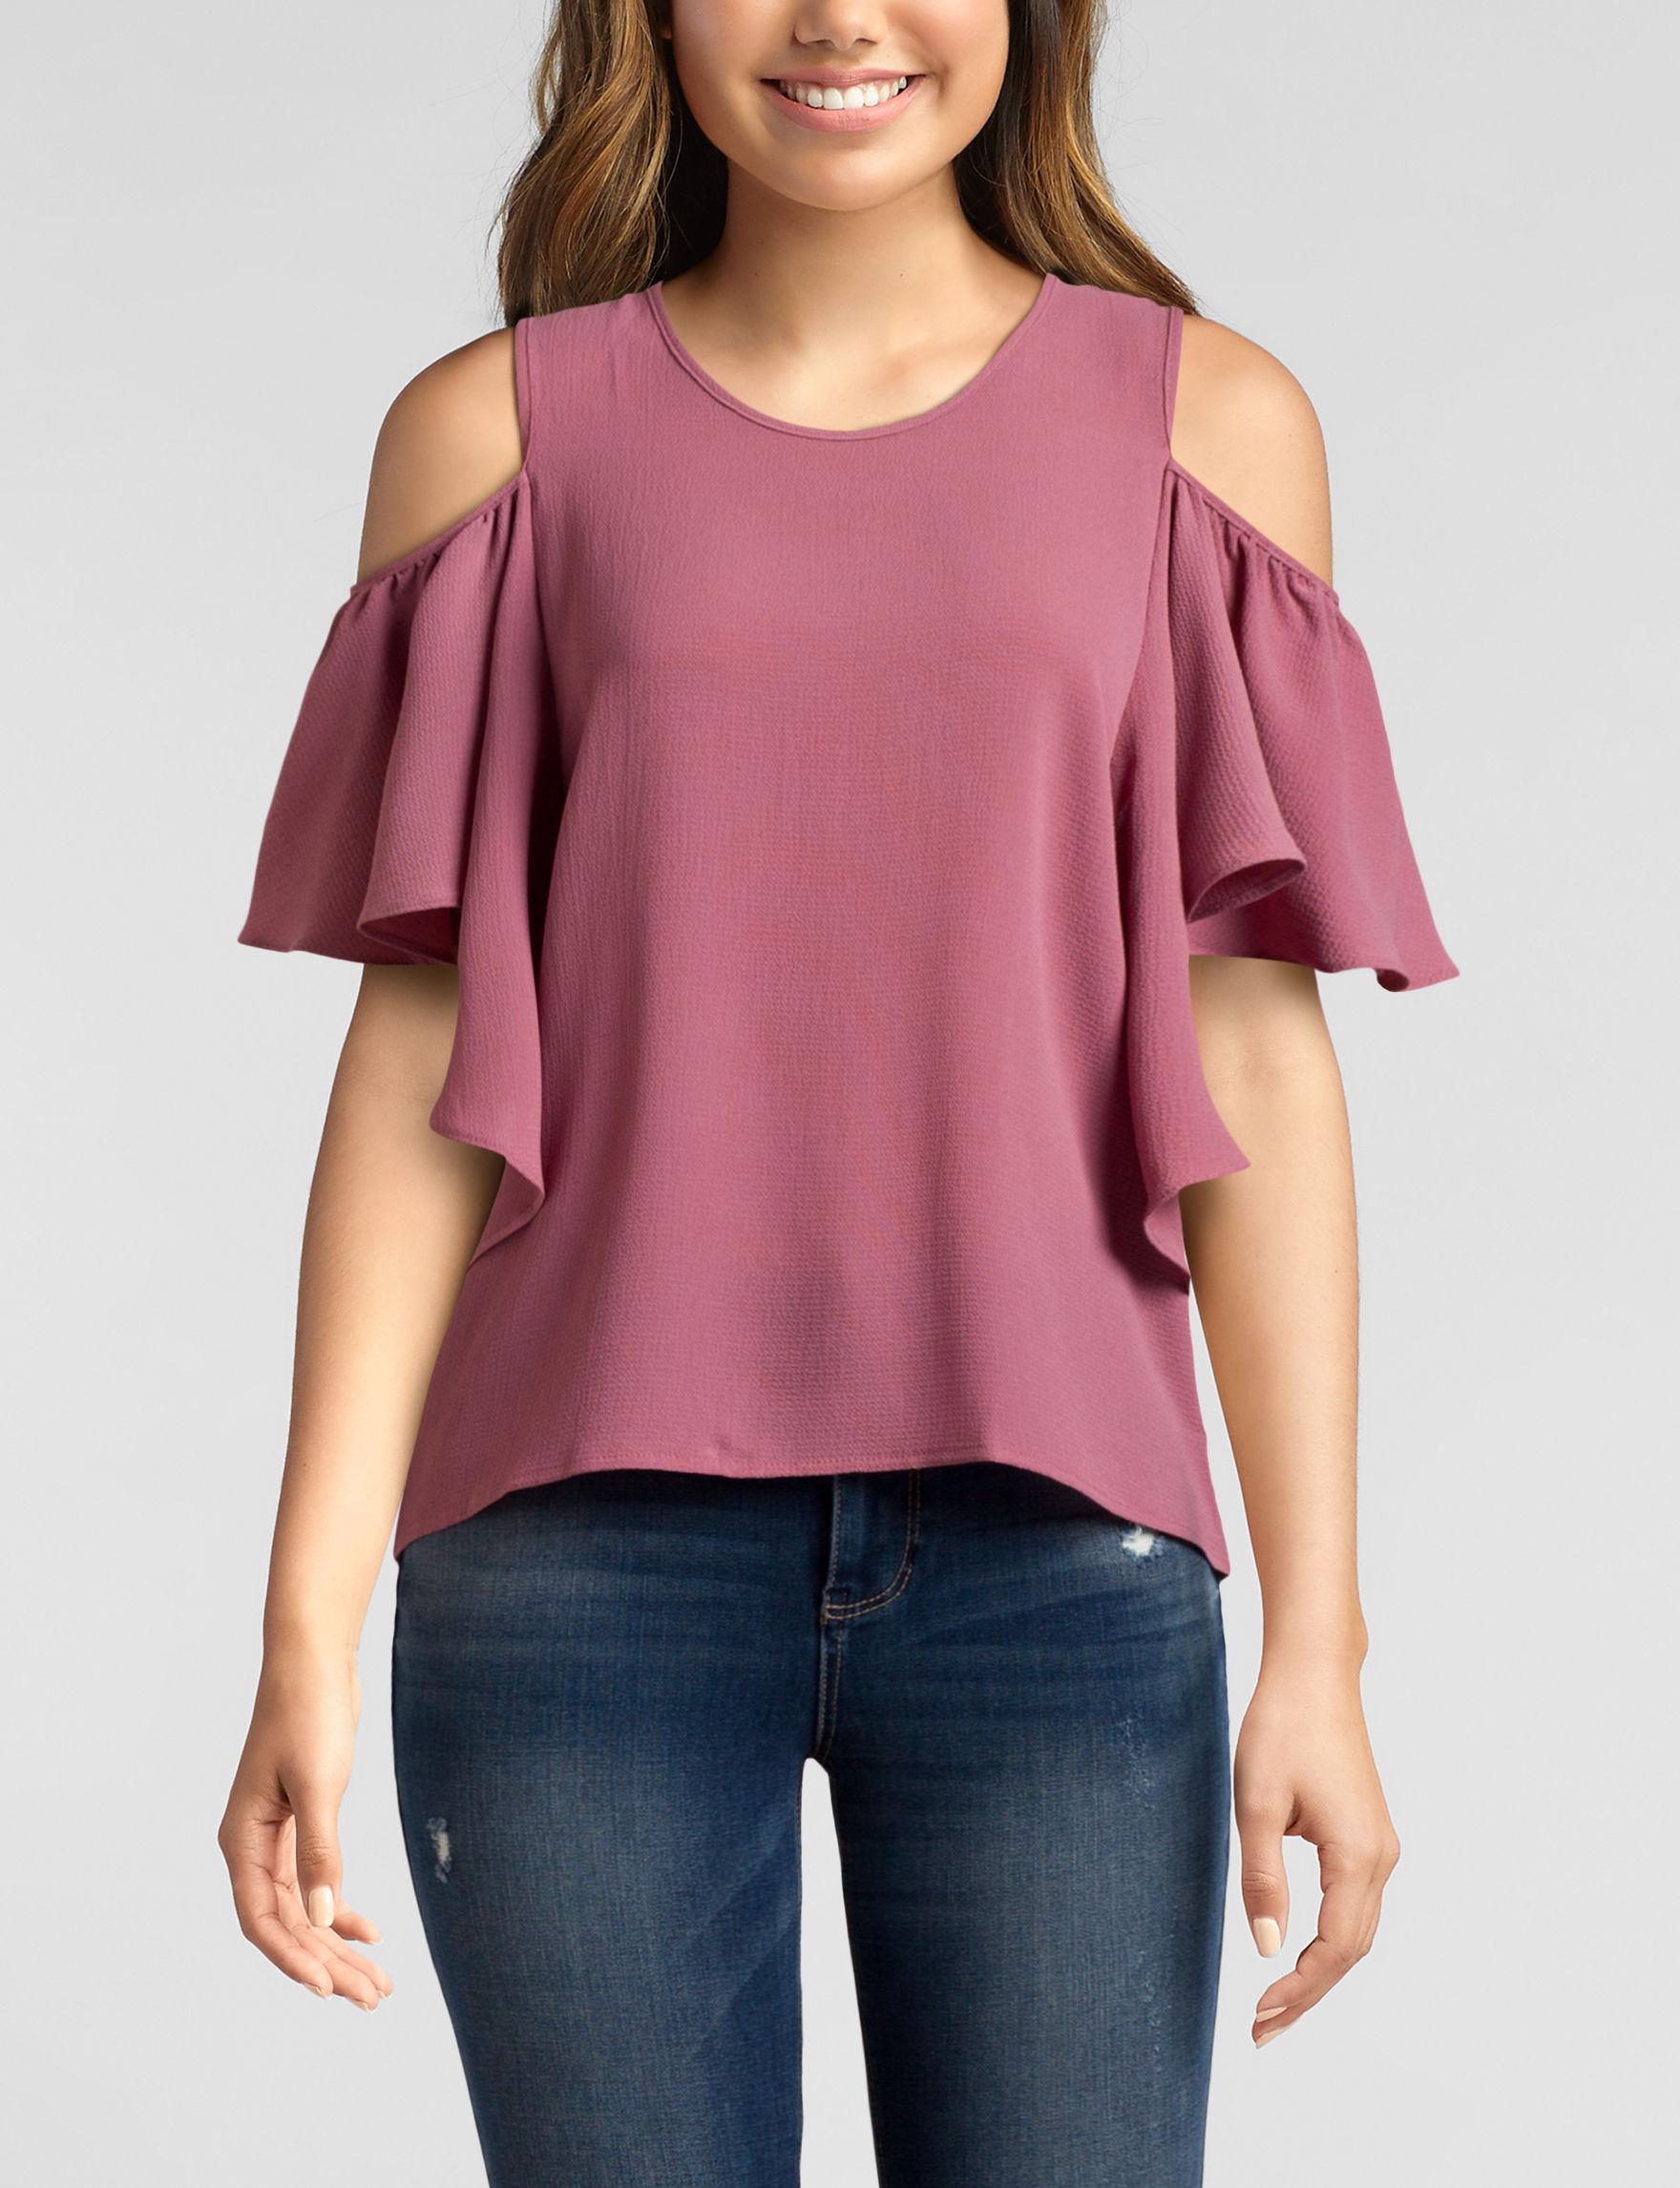 Moral Fiber Pink Shirts & Blouses